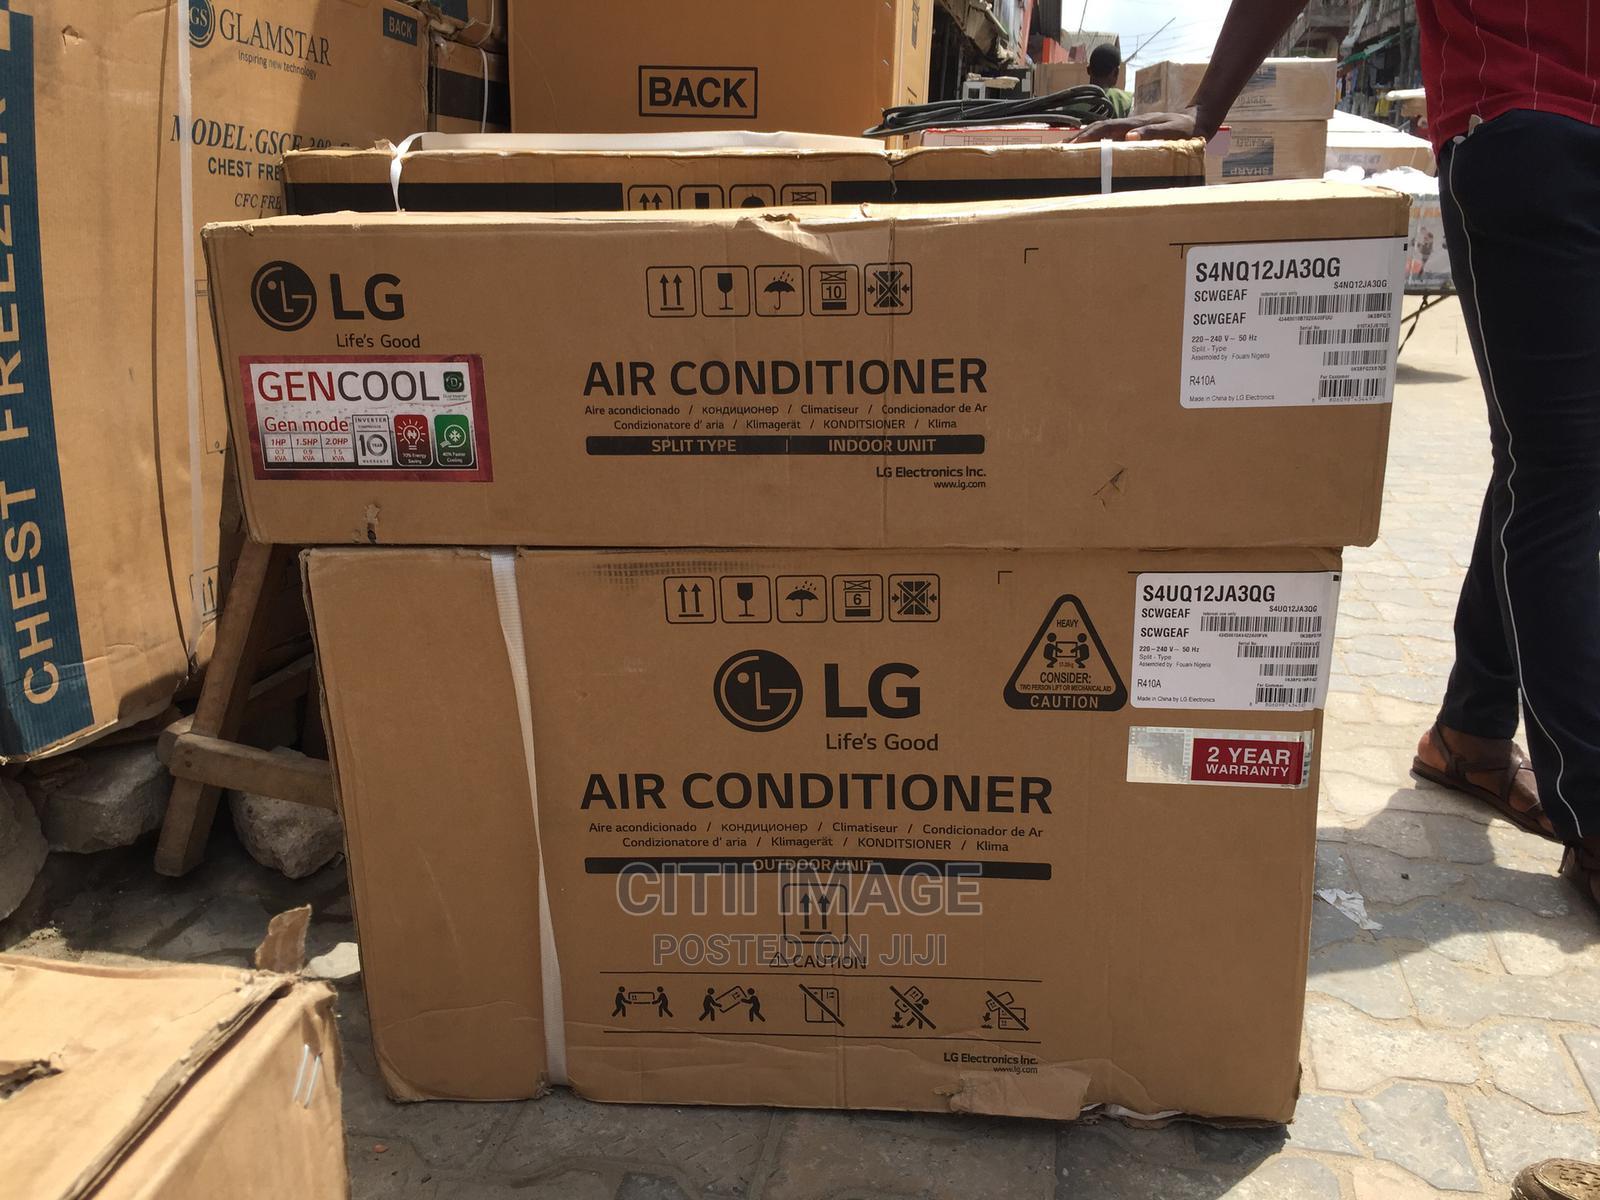 LG Gencool 1.5hp Air Conditioner